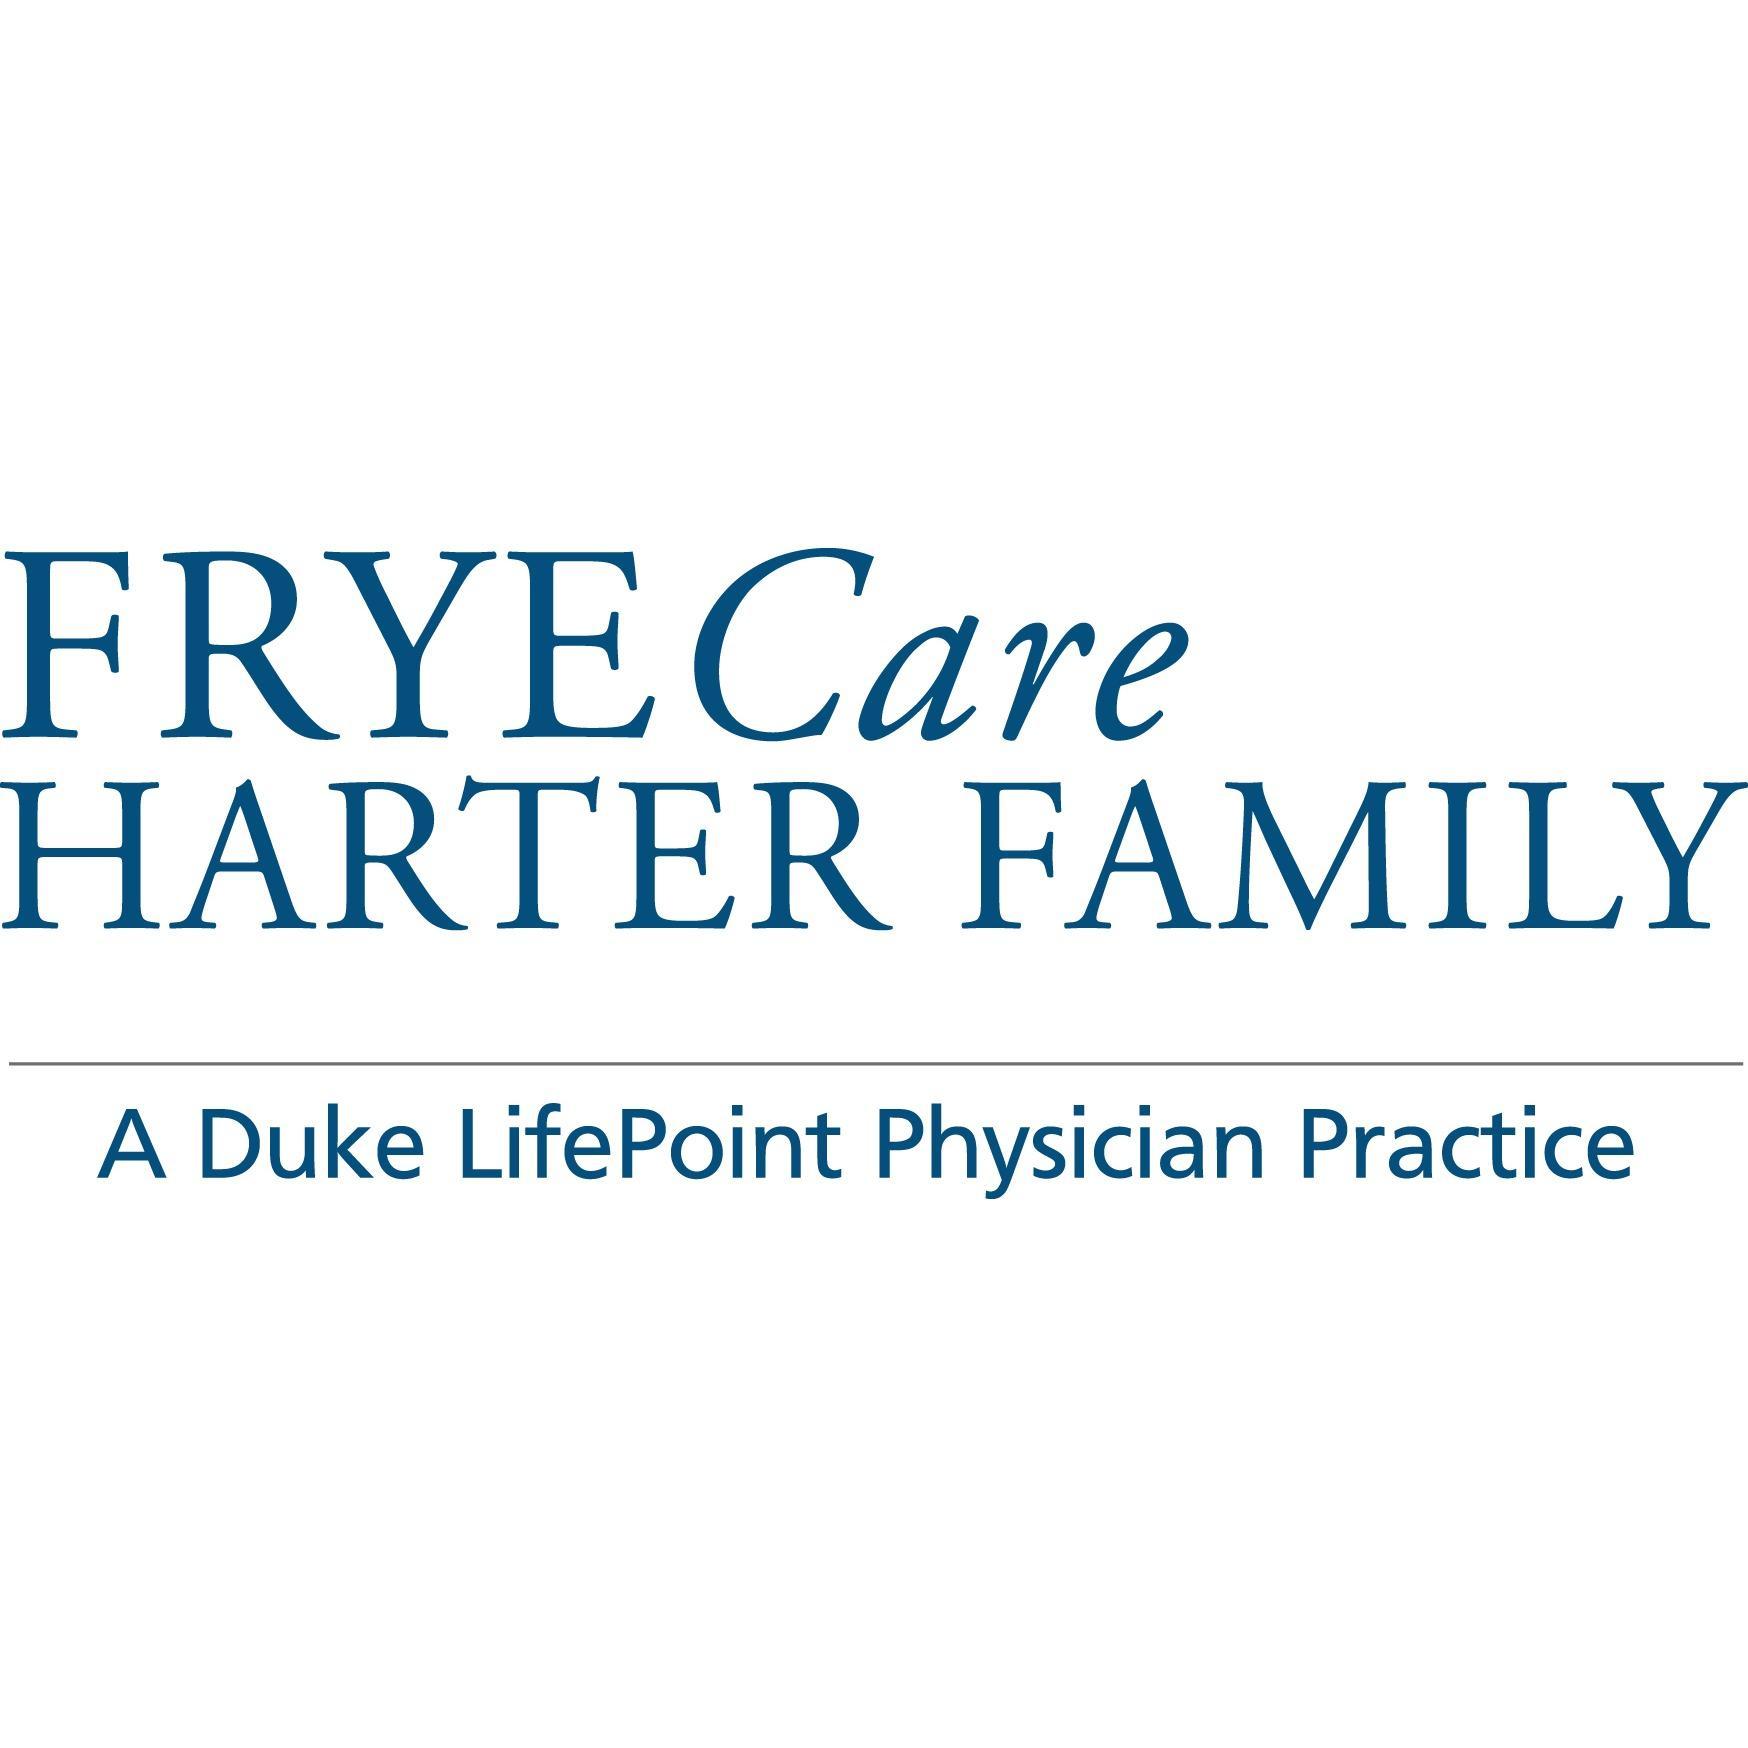 FryeCare Harter Family Practice